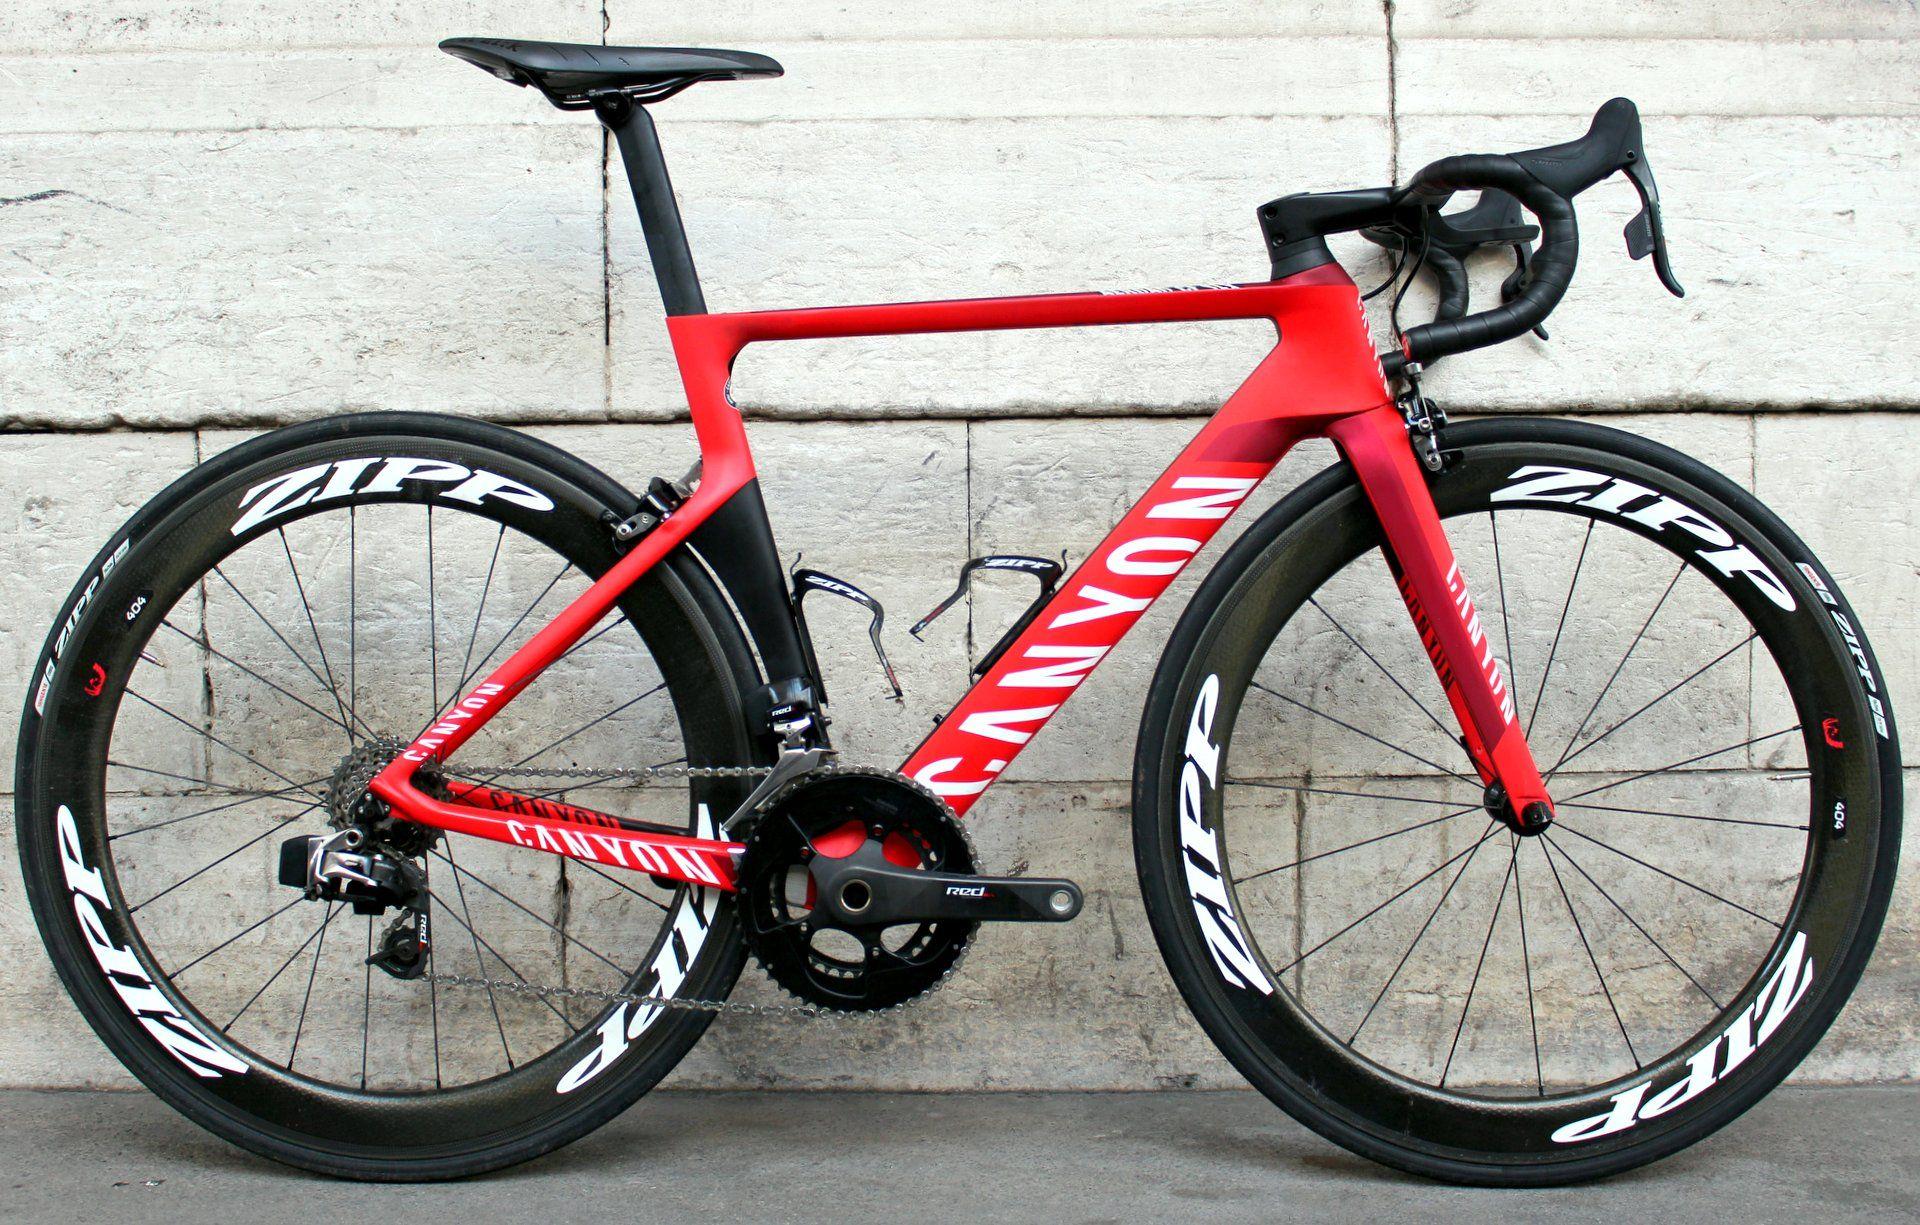 Canyon Aeroad (custom spec with SRAM Red eTap) - rev...  a865158263cd6